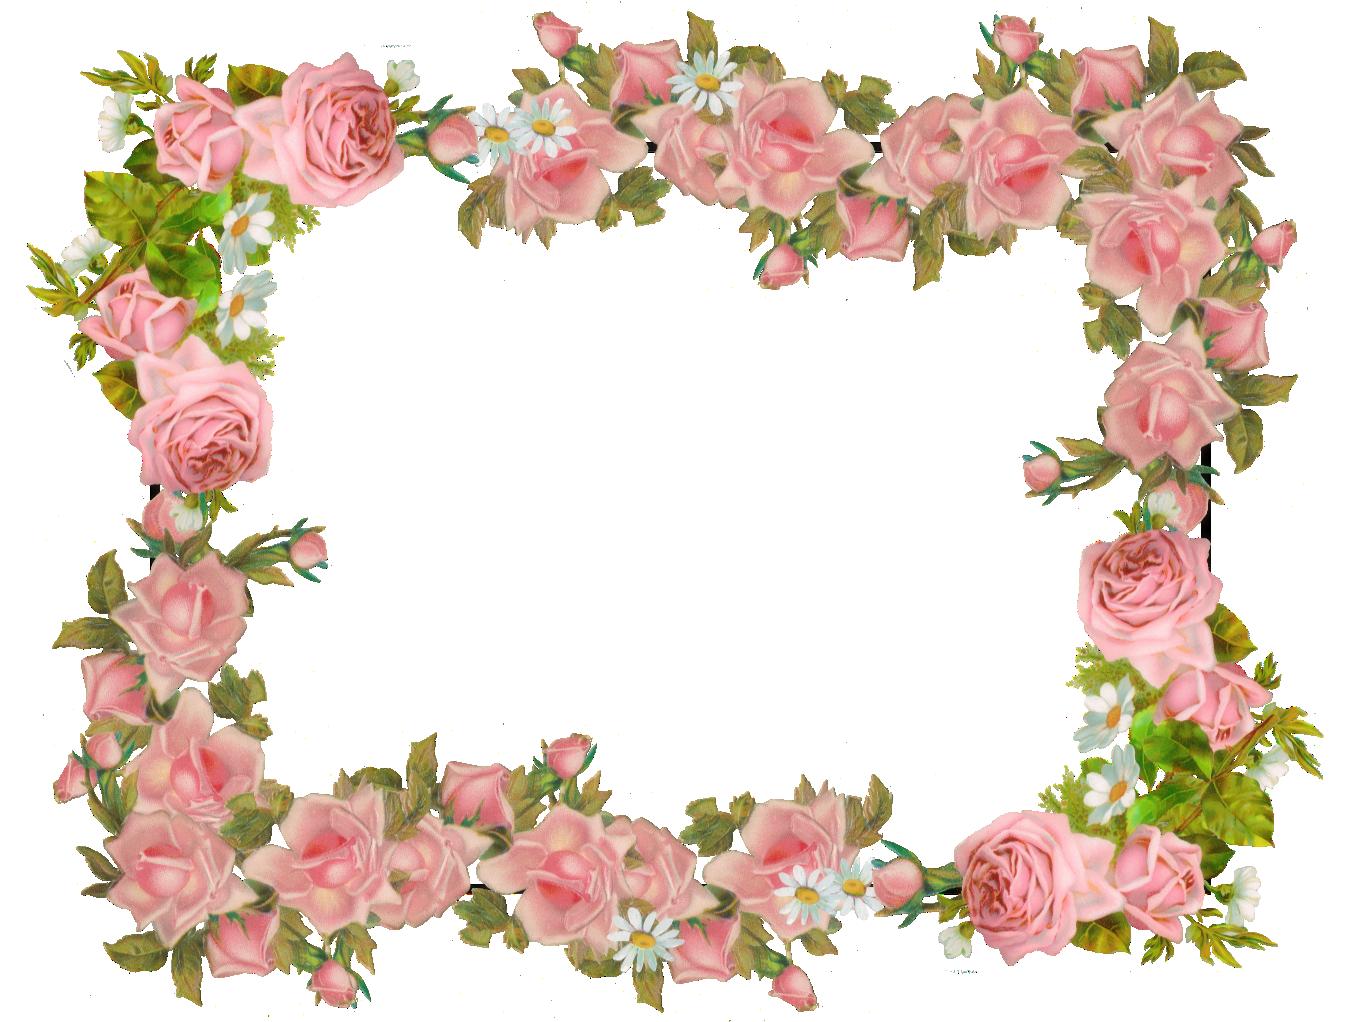 Succulent clipart scrapbooking supply. Free digital vintage rose